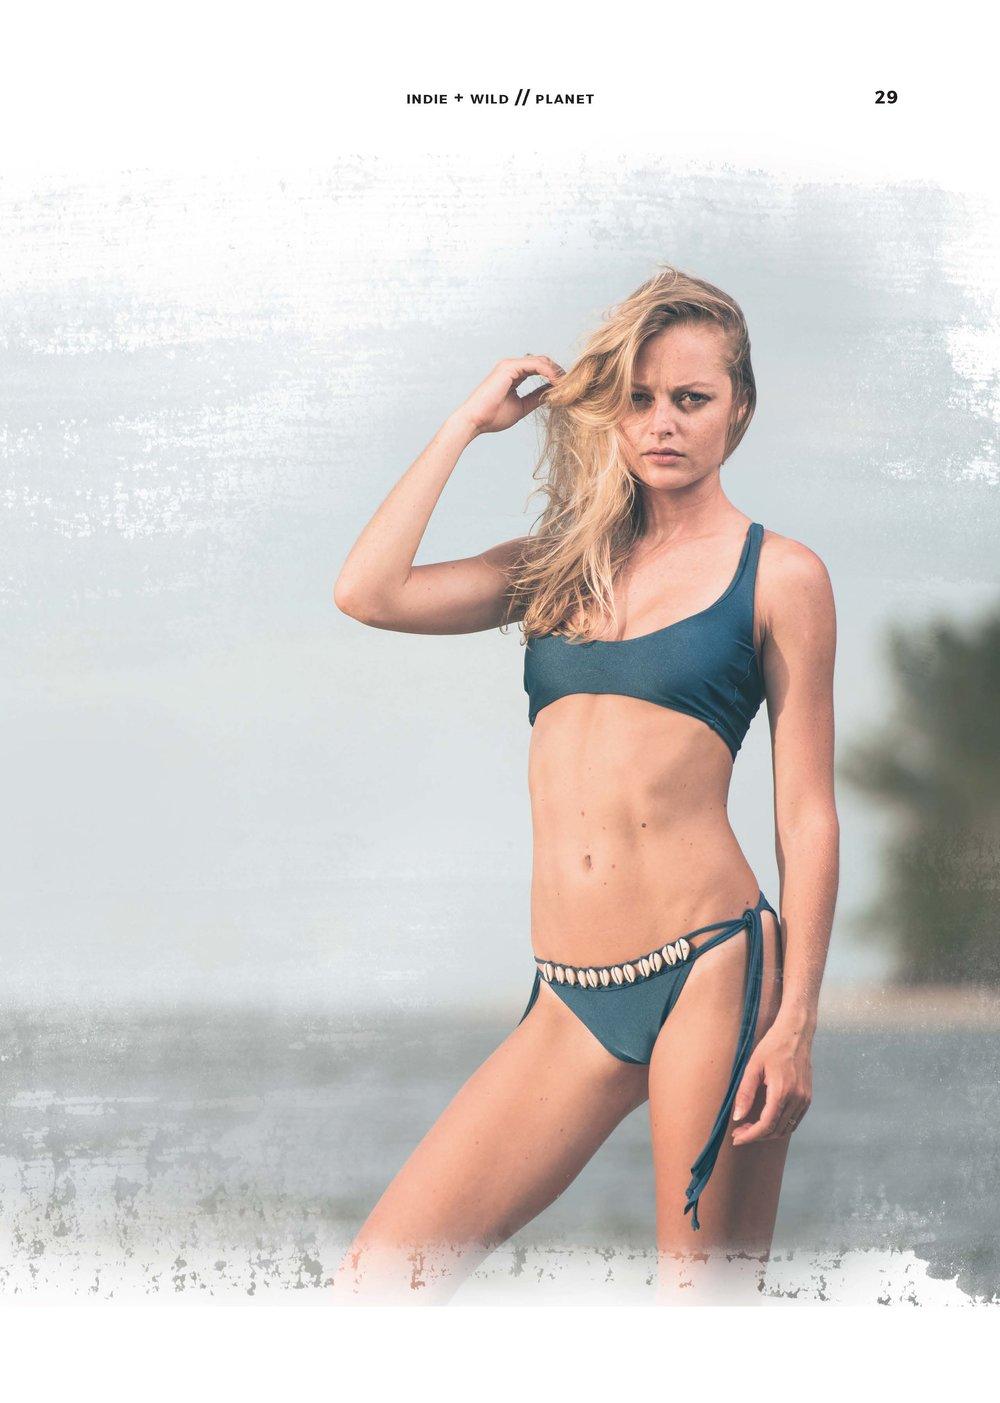 Bikini Megan Samperi nude (55 photo), Topless, Paparazzi, Instagram, in bikini 2018